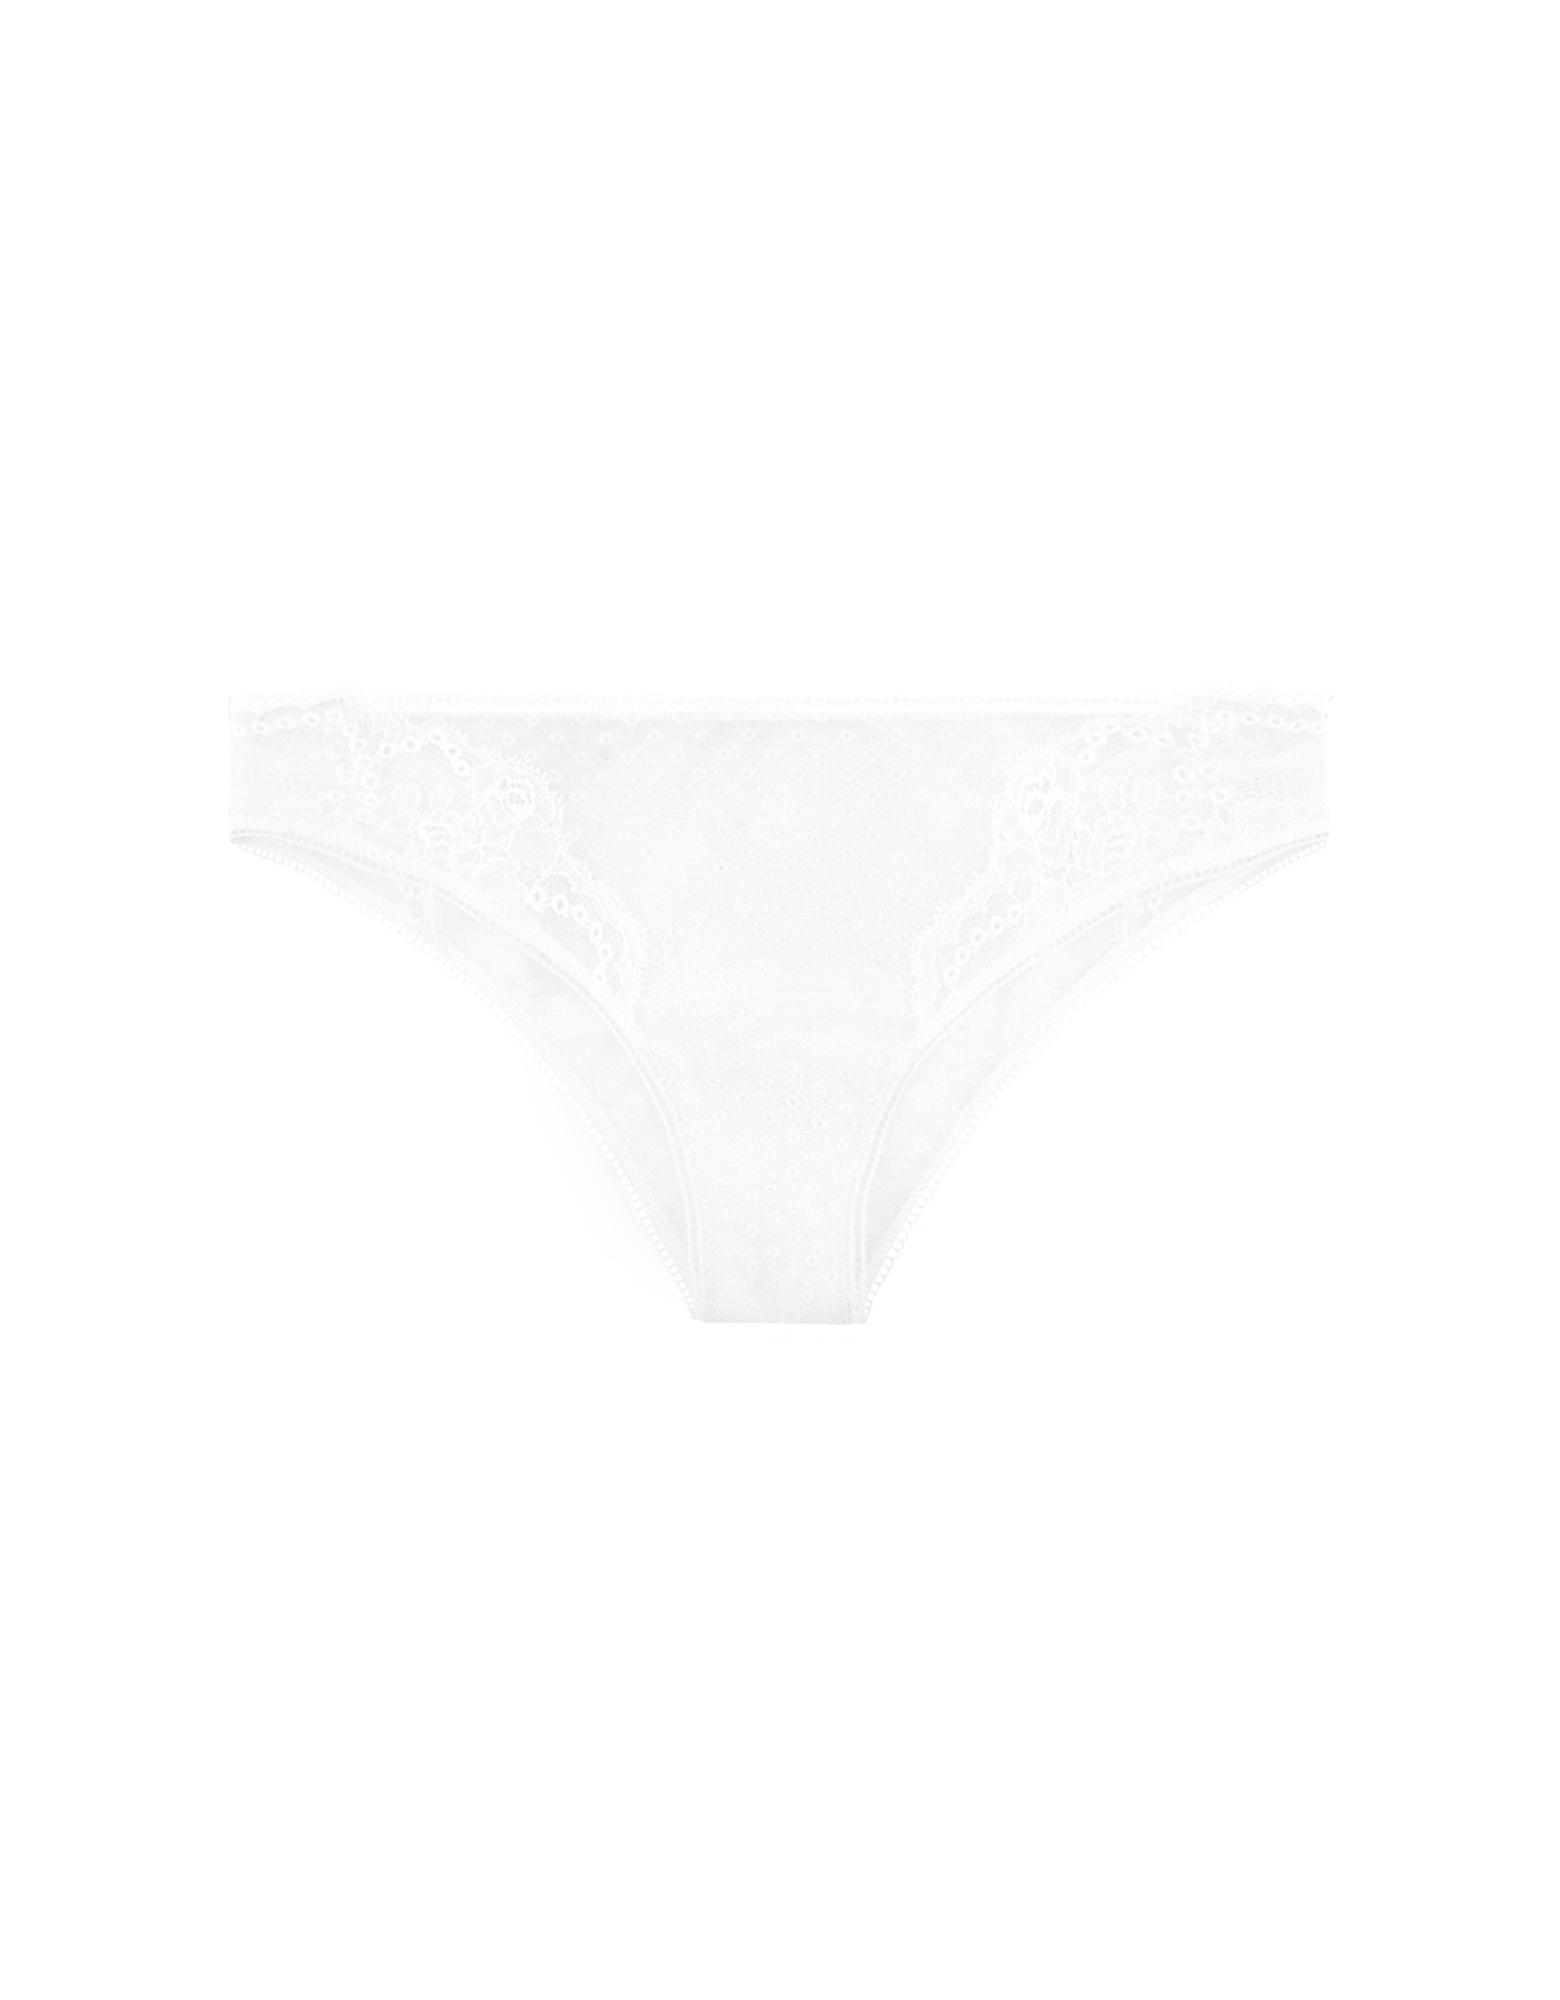 La Perla Panties, Tuberose White Leavers Lace Brazilian Briefs